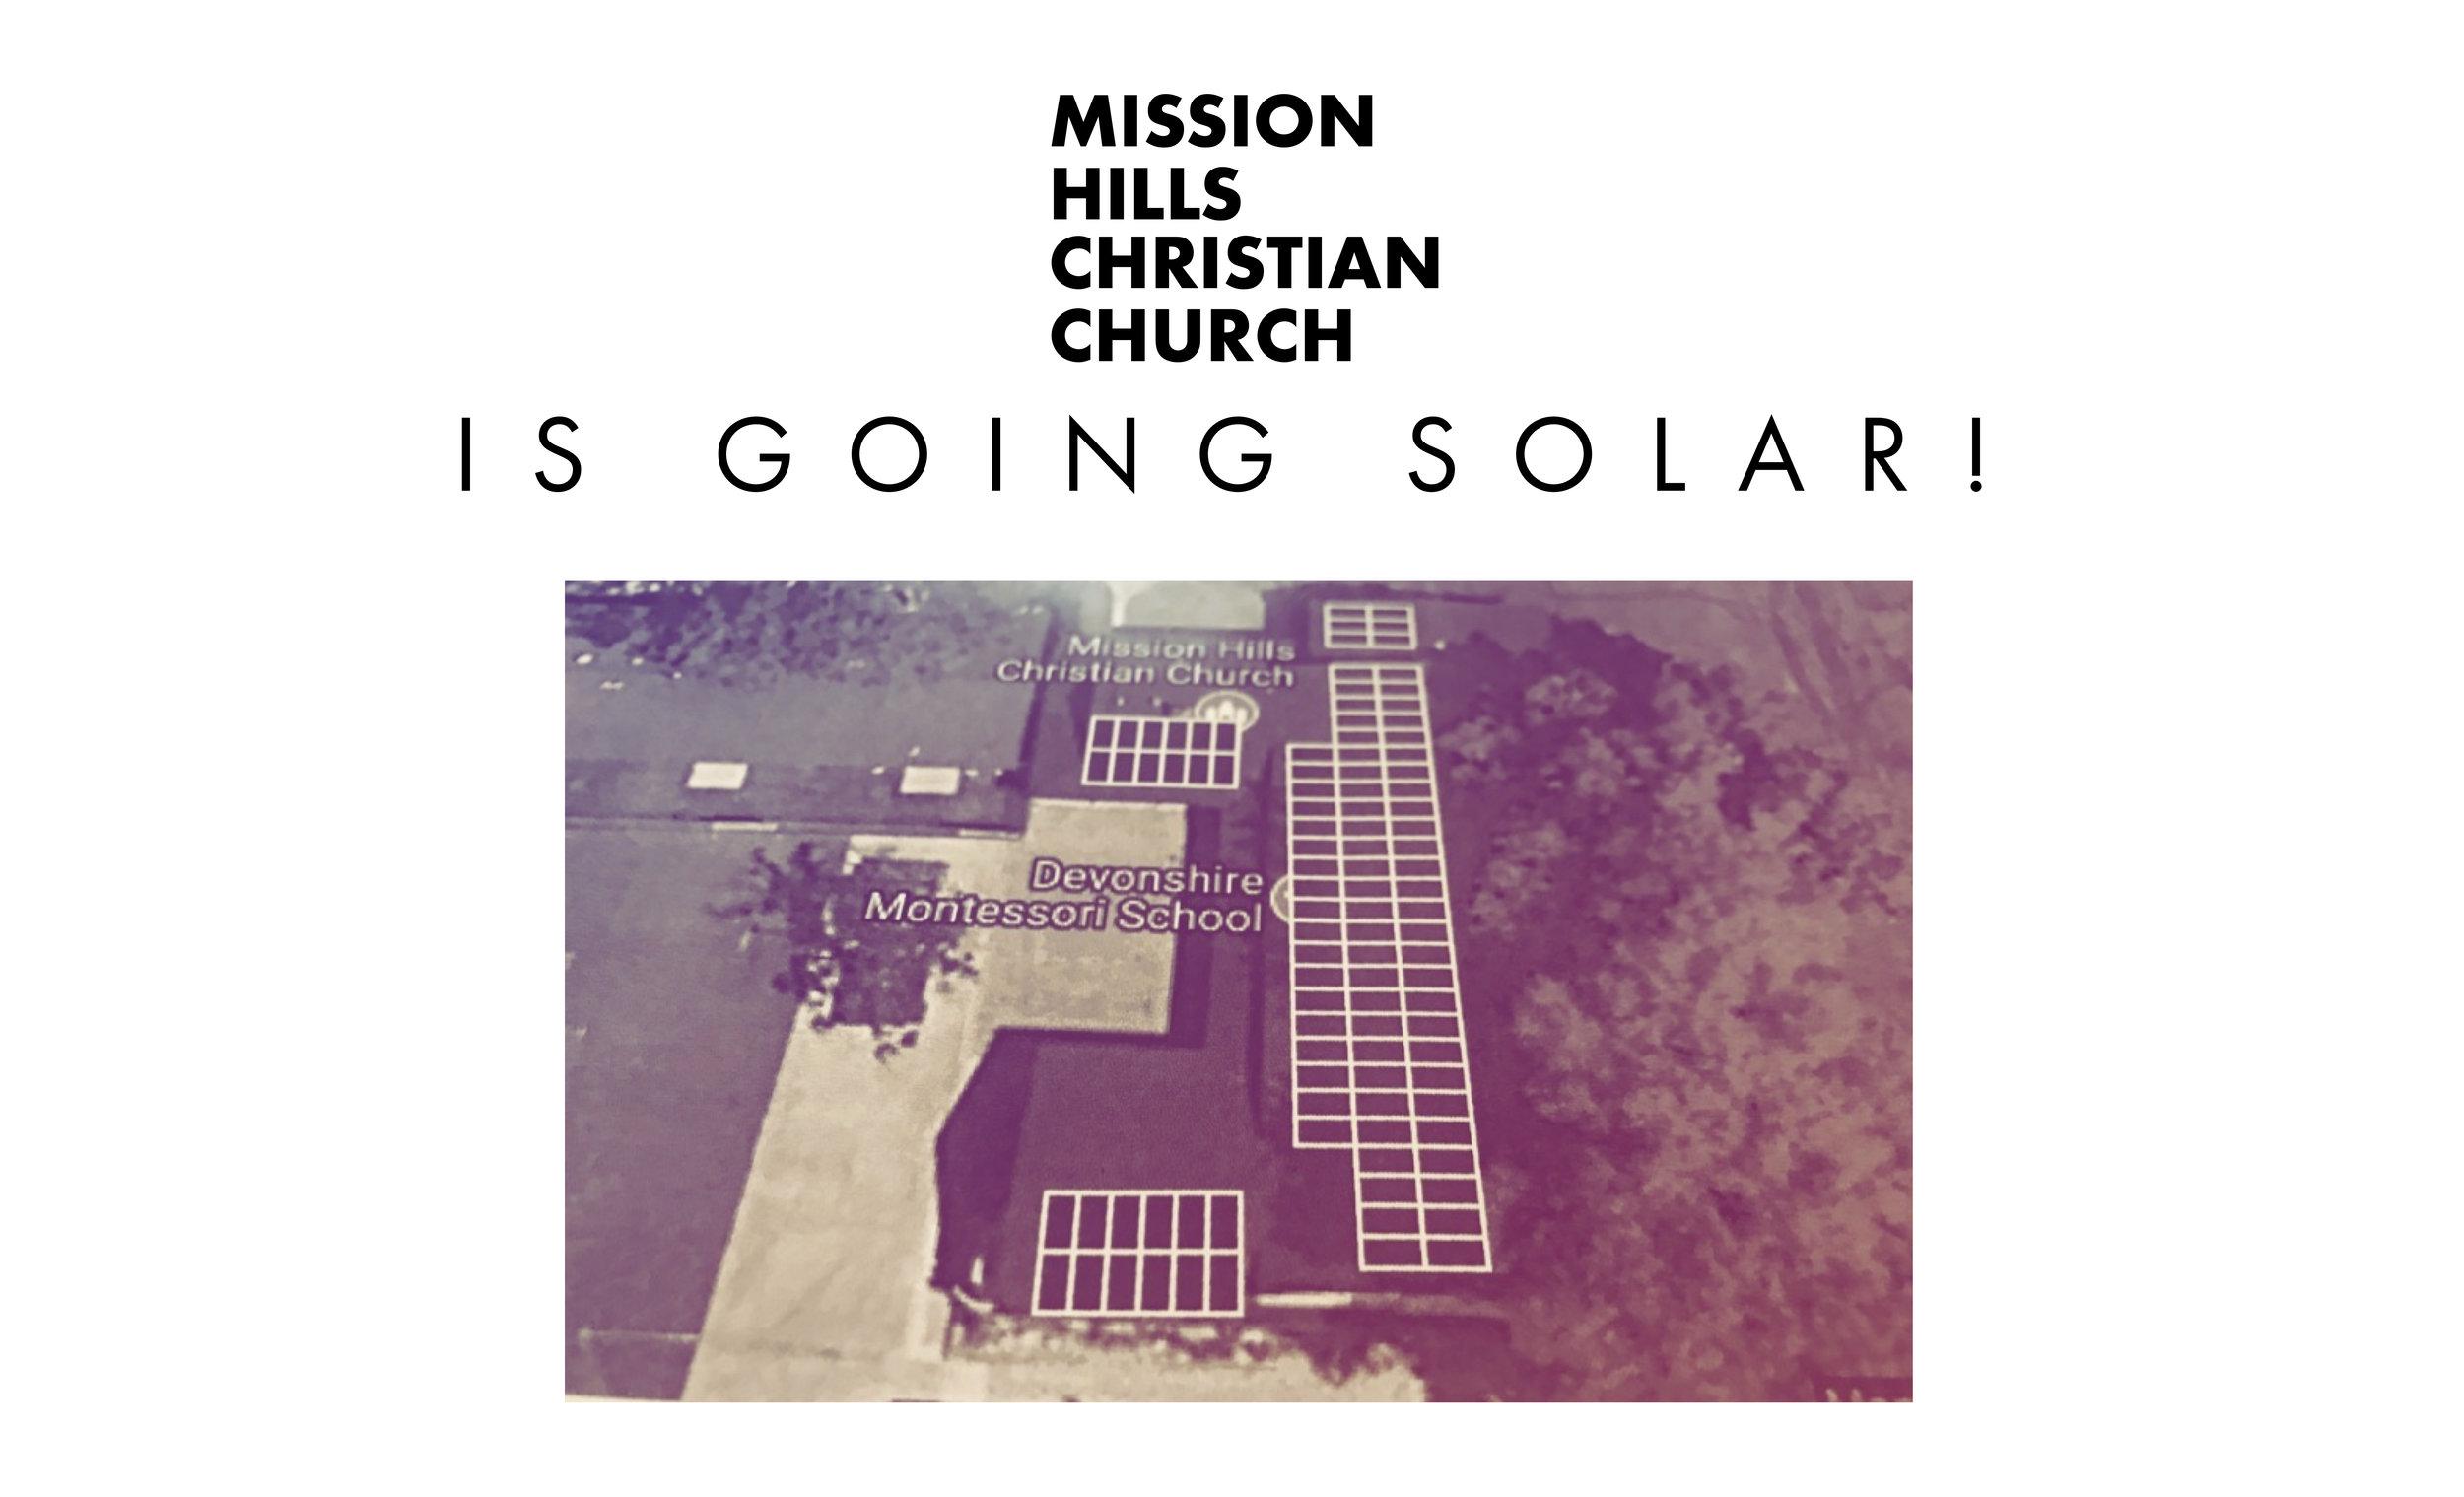 mission-hills-christian-church-is-going-solar-los-angeles-fundraiser.jpg